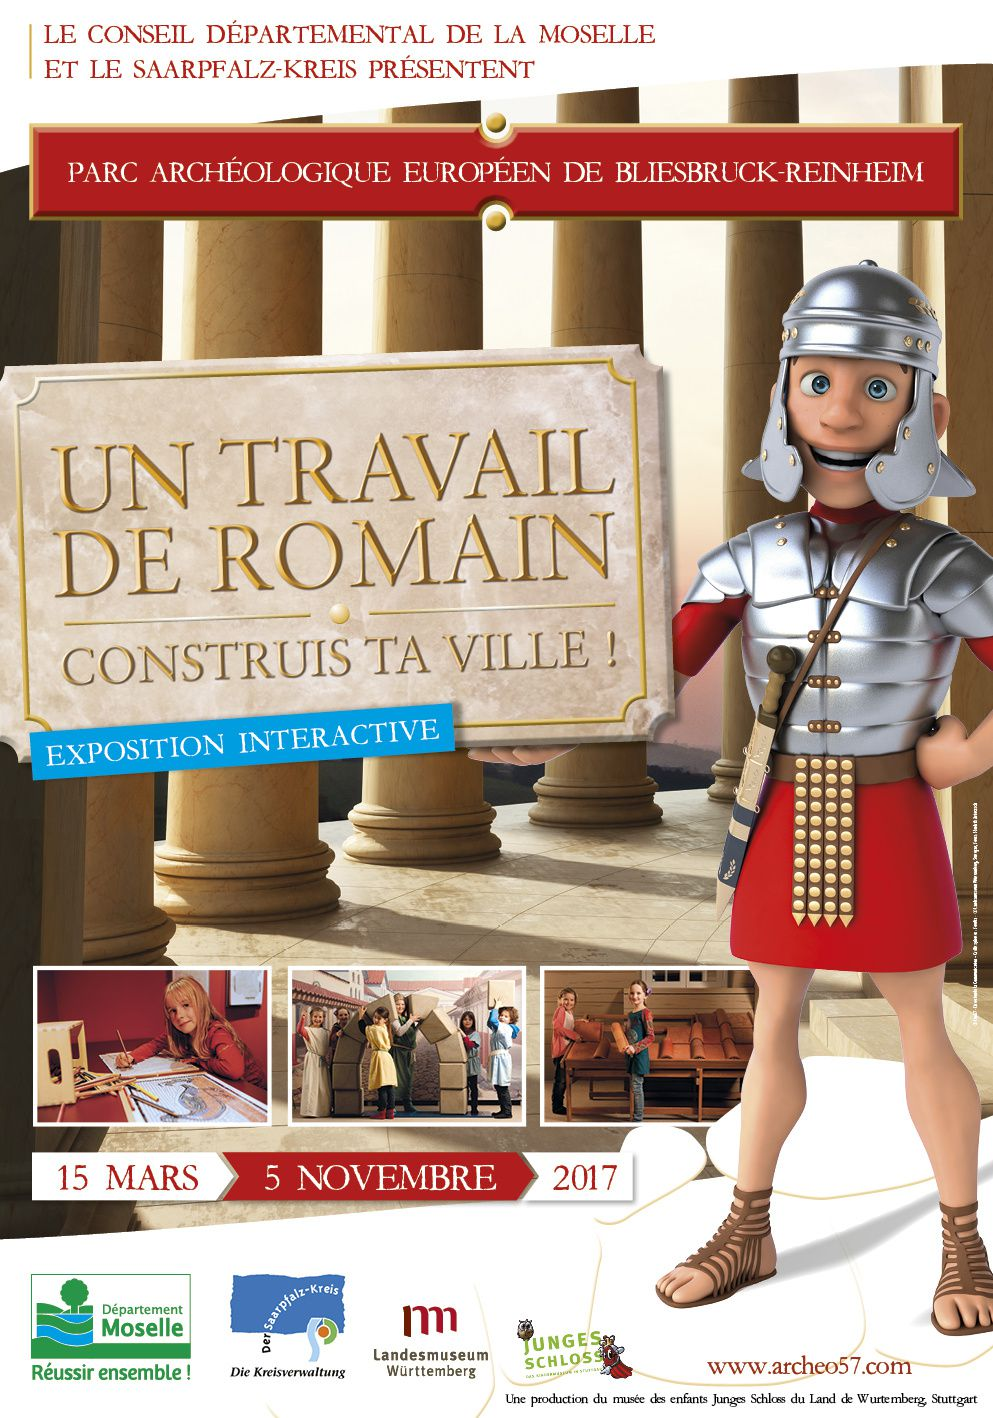 Bliesbruck-Reinheim Exposition « Un travail de Romain : construis ta ville ! » du 15 mars au 5 novembre 2017